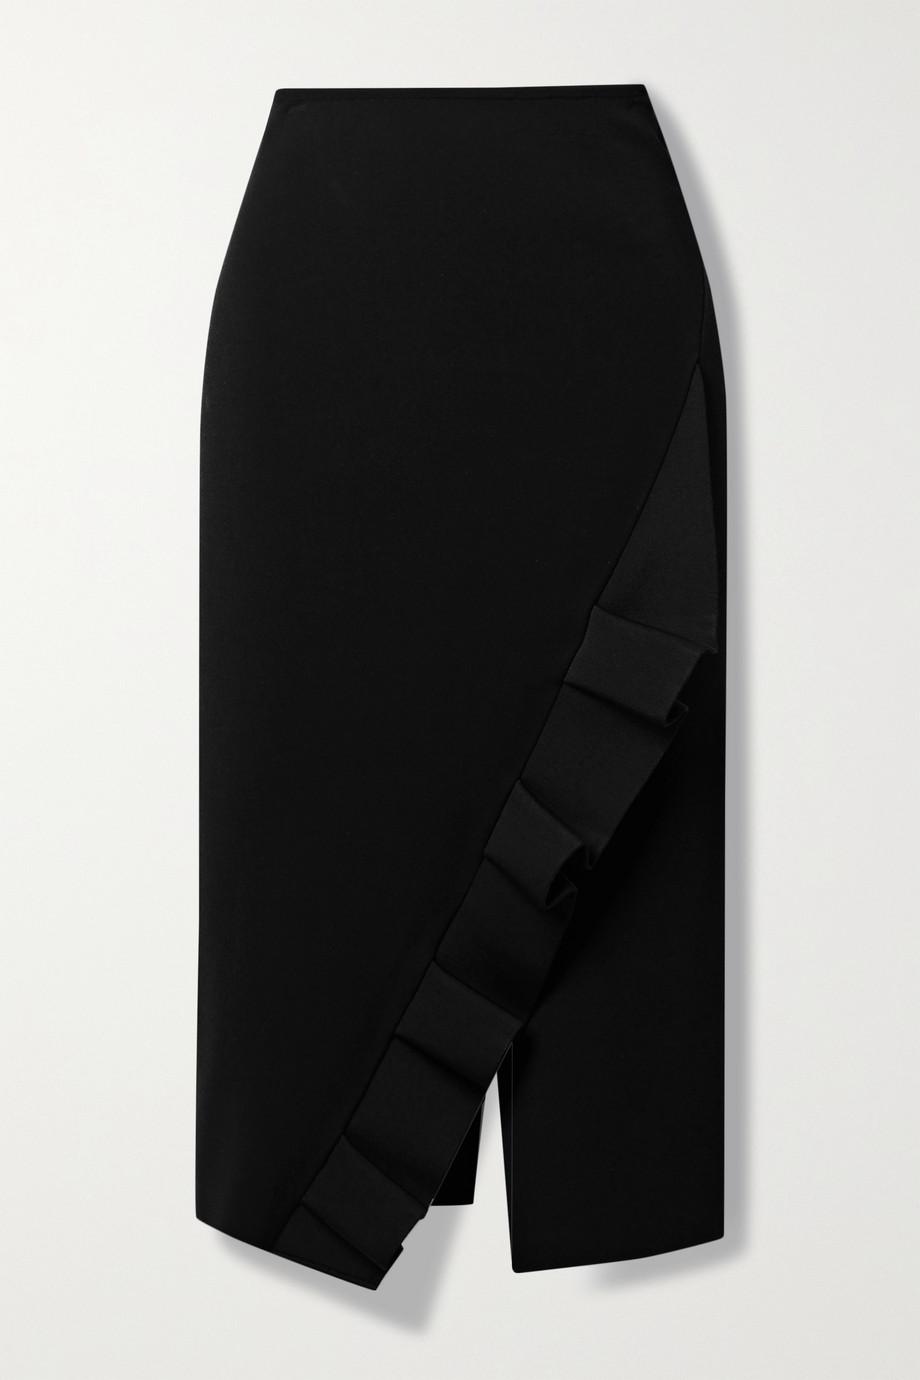 Roland Mouret Bernword ruffled stretch-crepe skirt